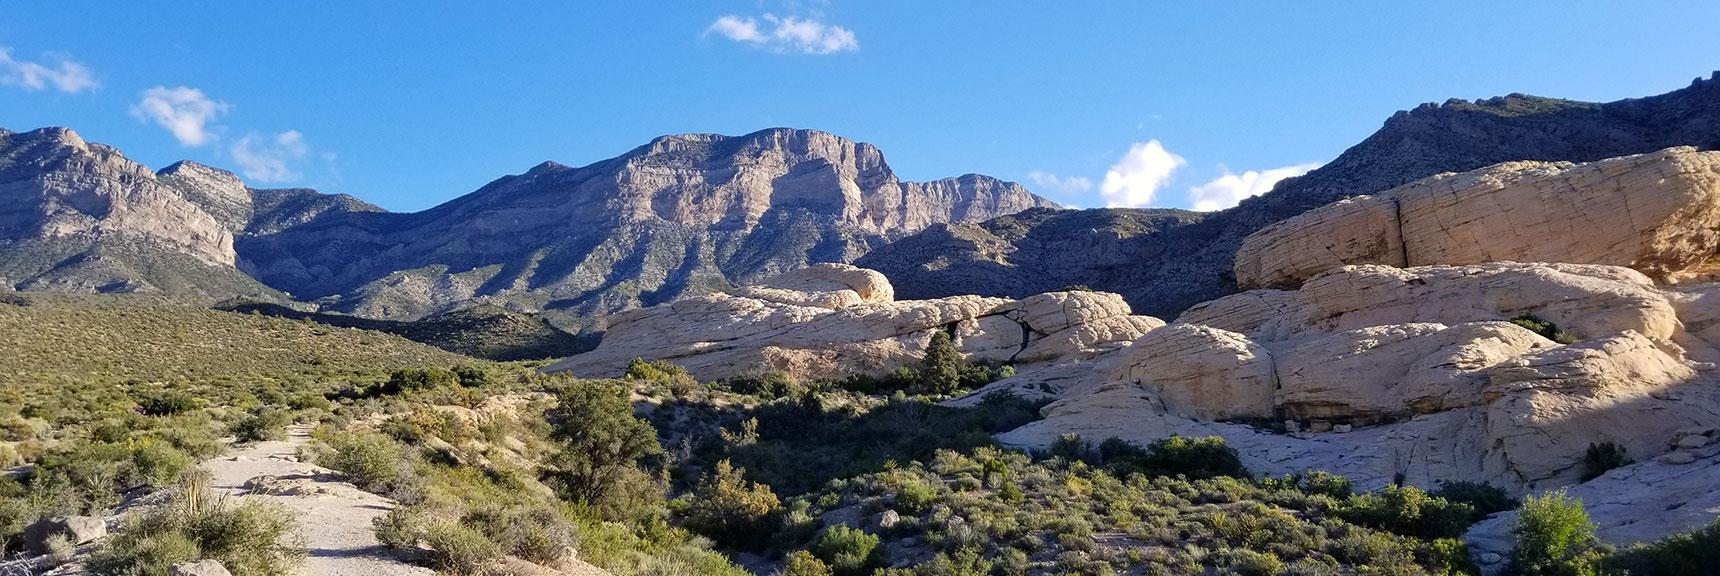 Trail Toward Turtlehead Peak in Red Rock National Park, Nevada